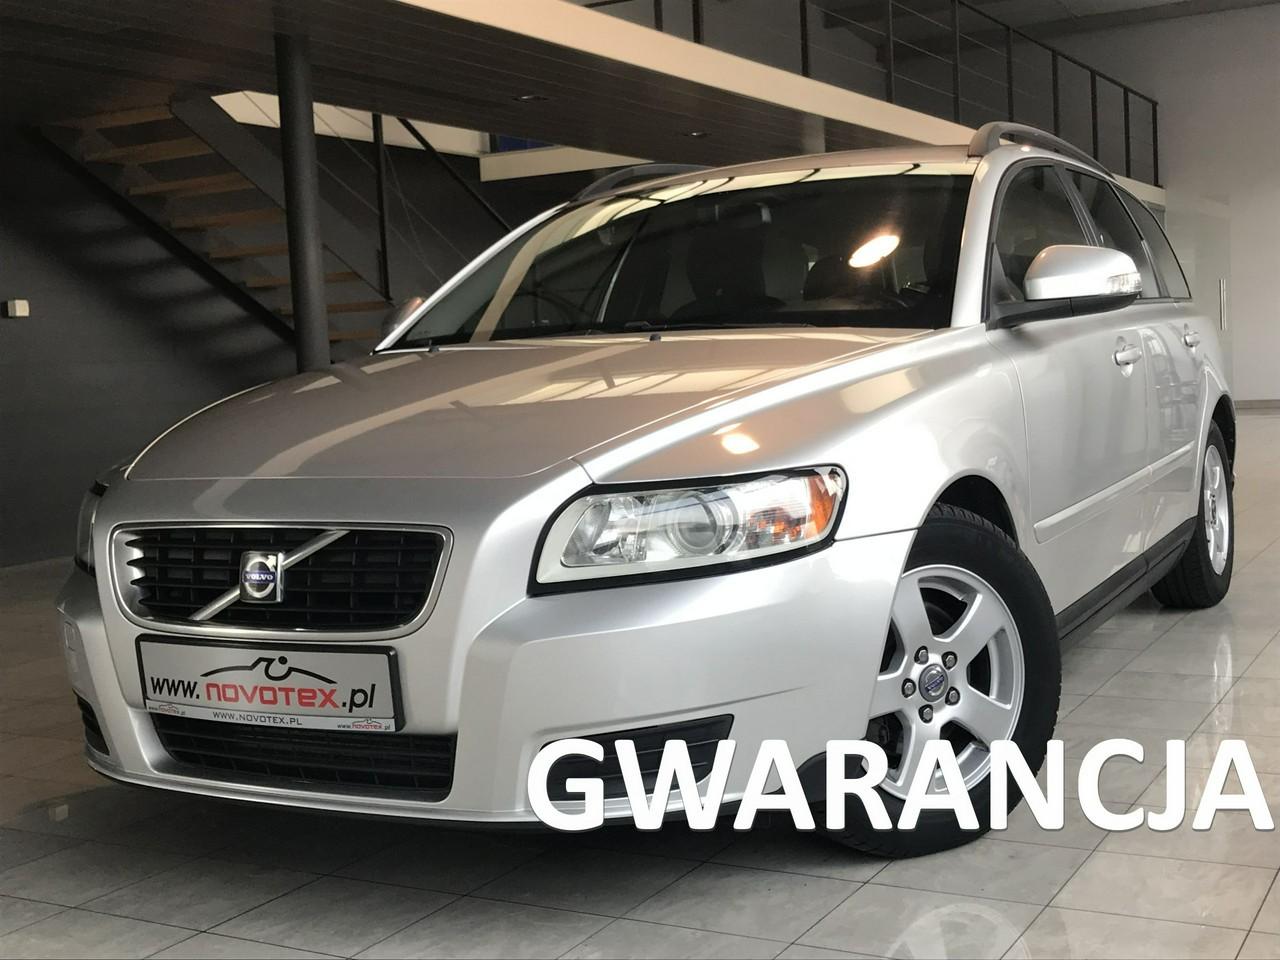 Volvo V50 1.6D*Momentum*model 2010*pełny serwis w ASO*Gwarancja VIP Gwarant